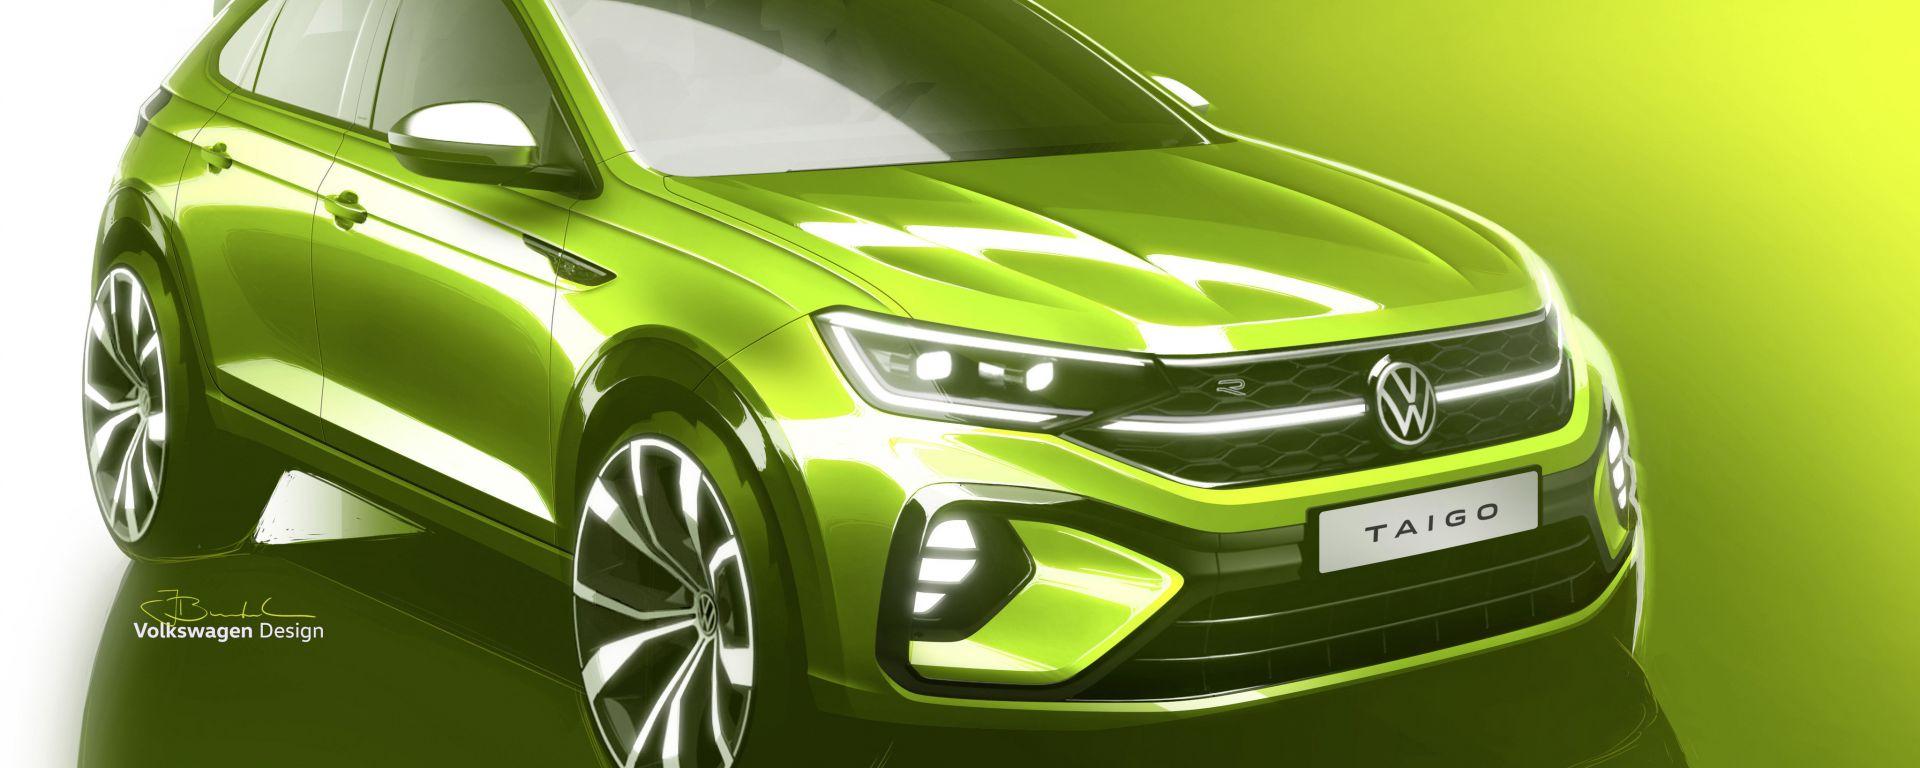 Volkswagen Taigo, il nuovo SUV coupé